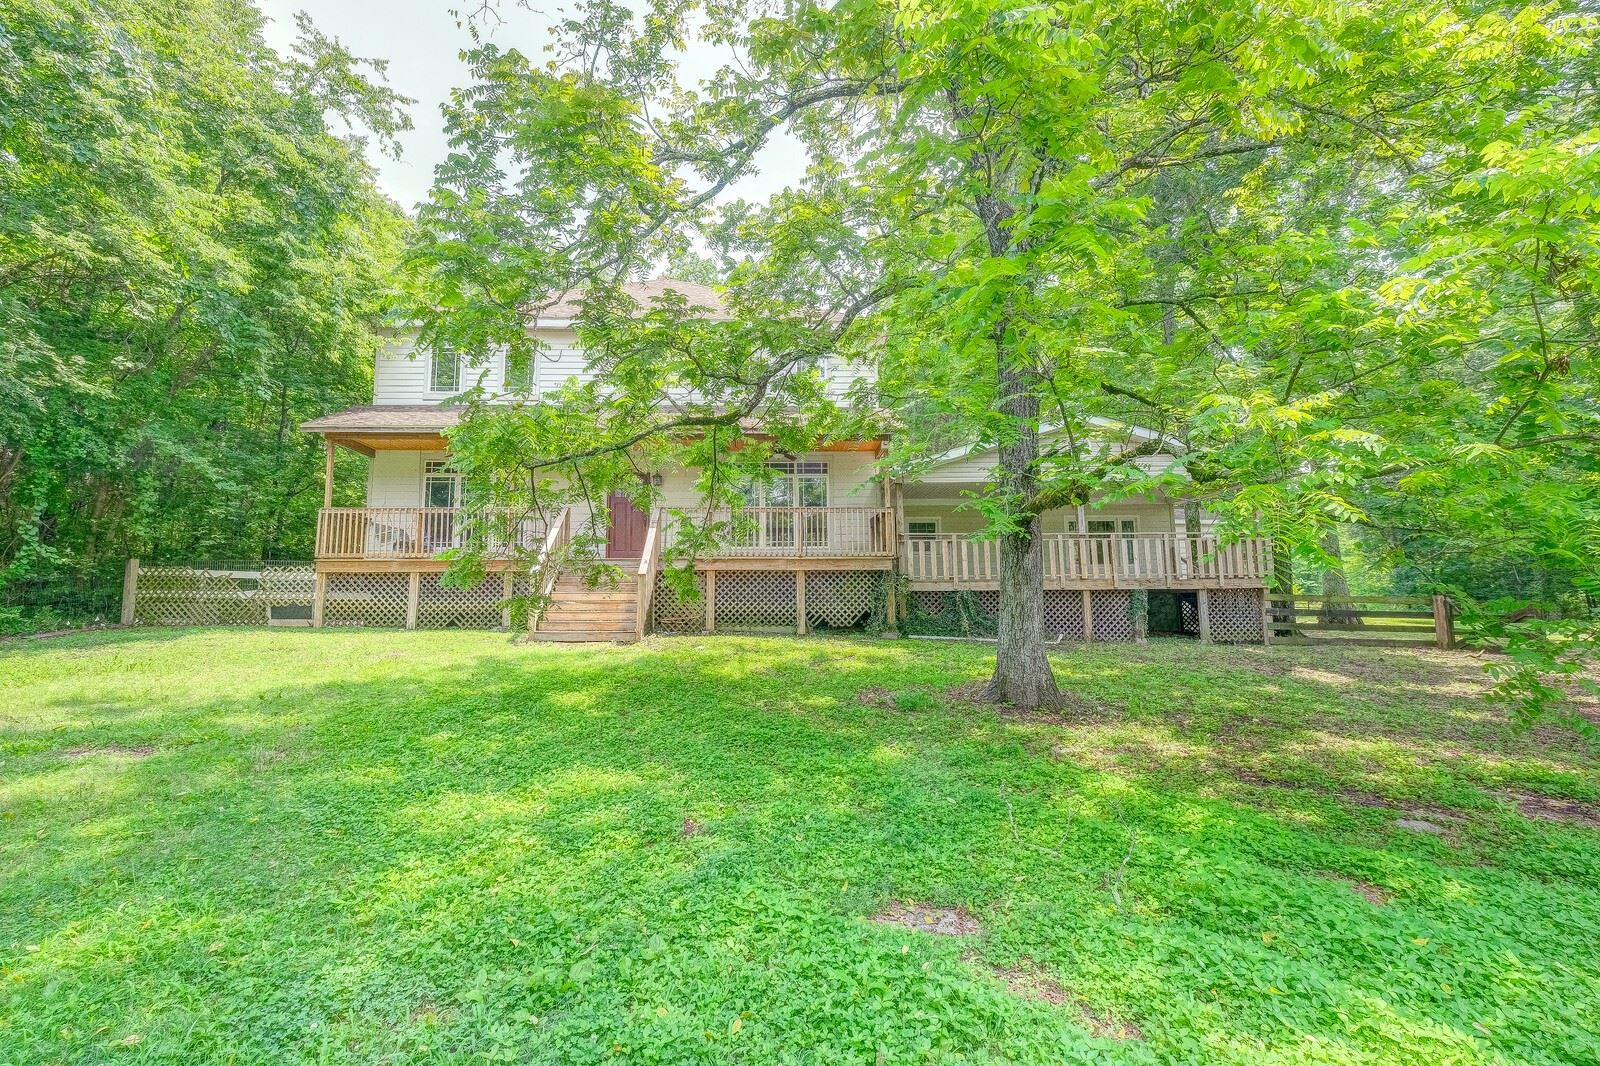 9815 Split Log Rd, Brentwood, TN 37027 - MLS#: 2277743